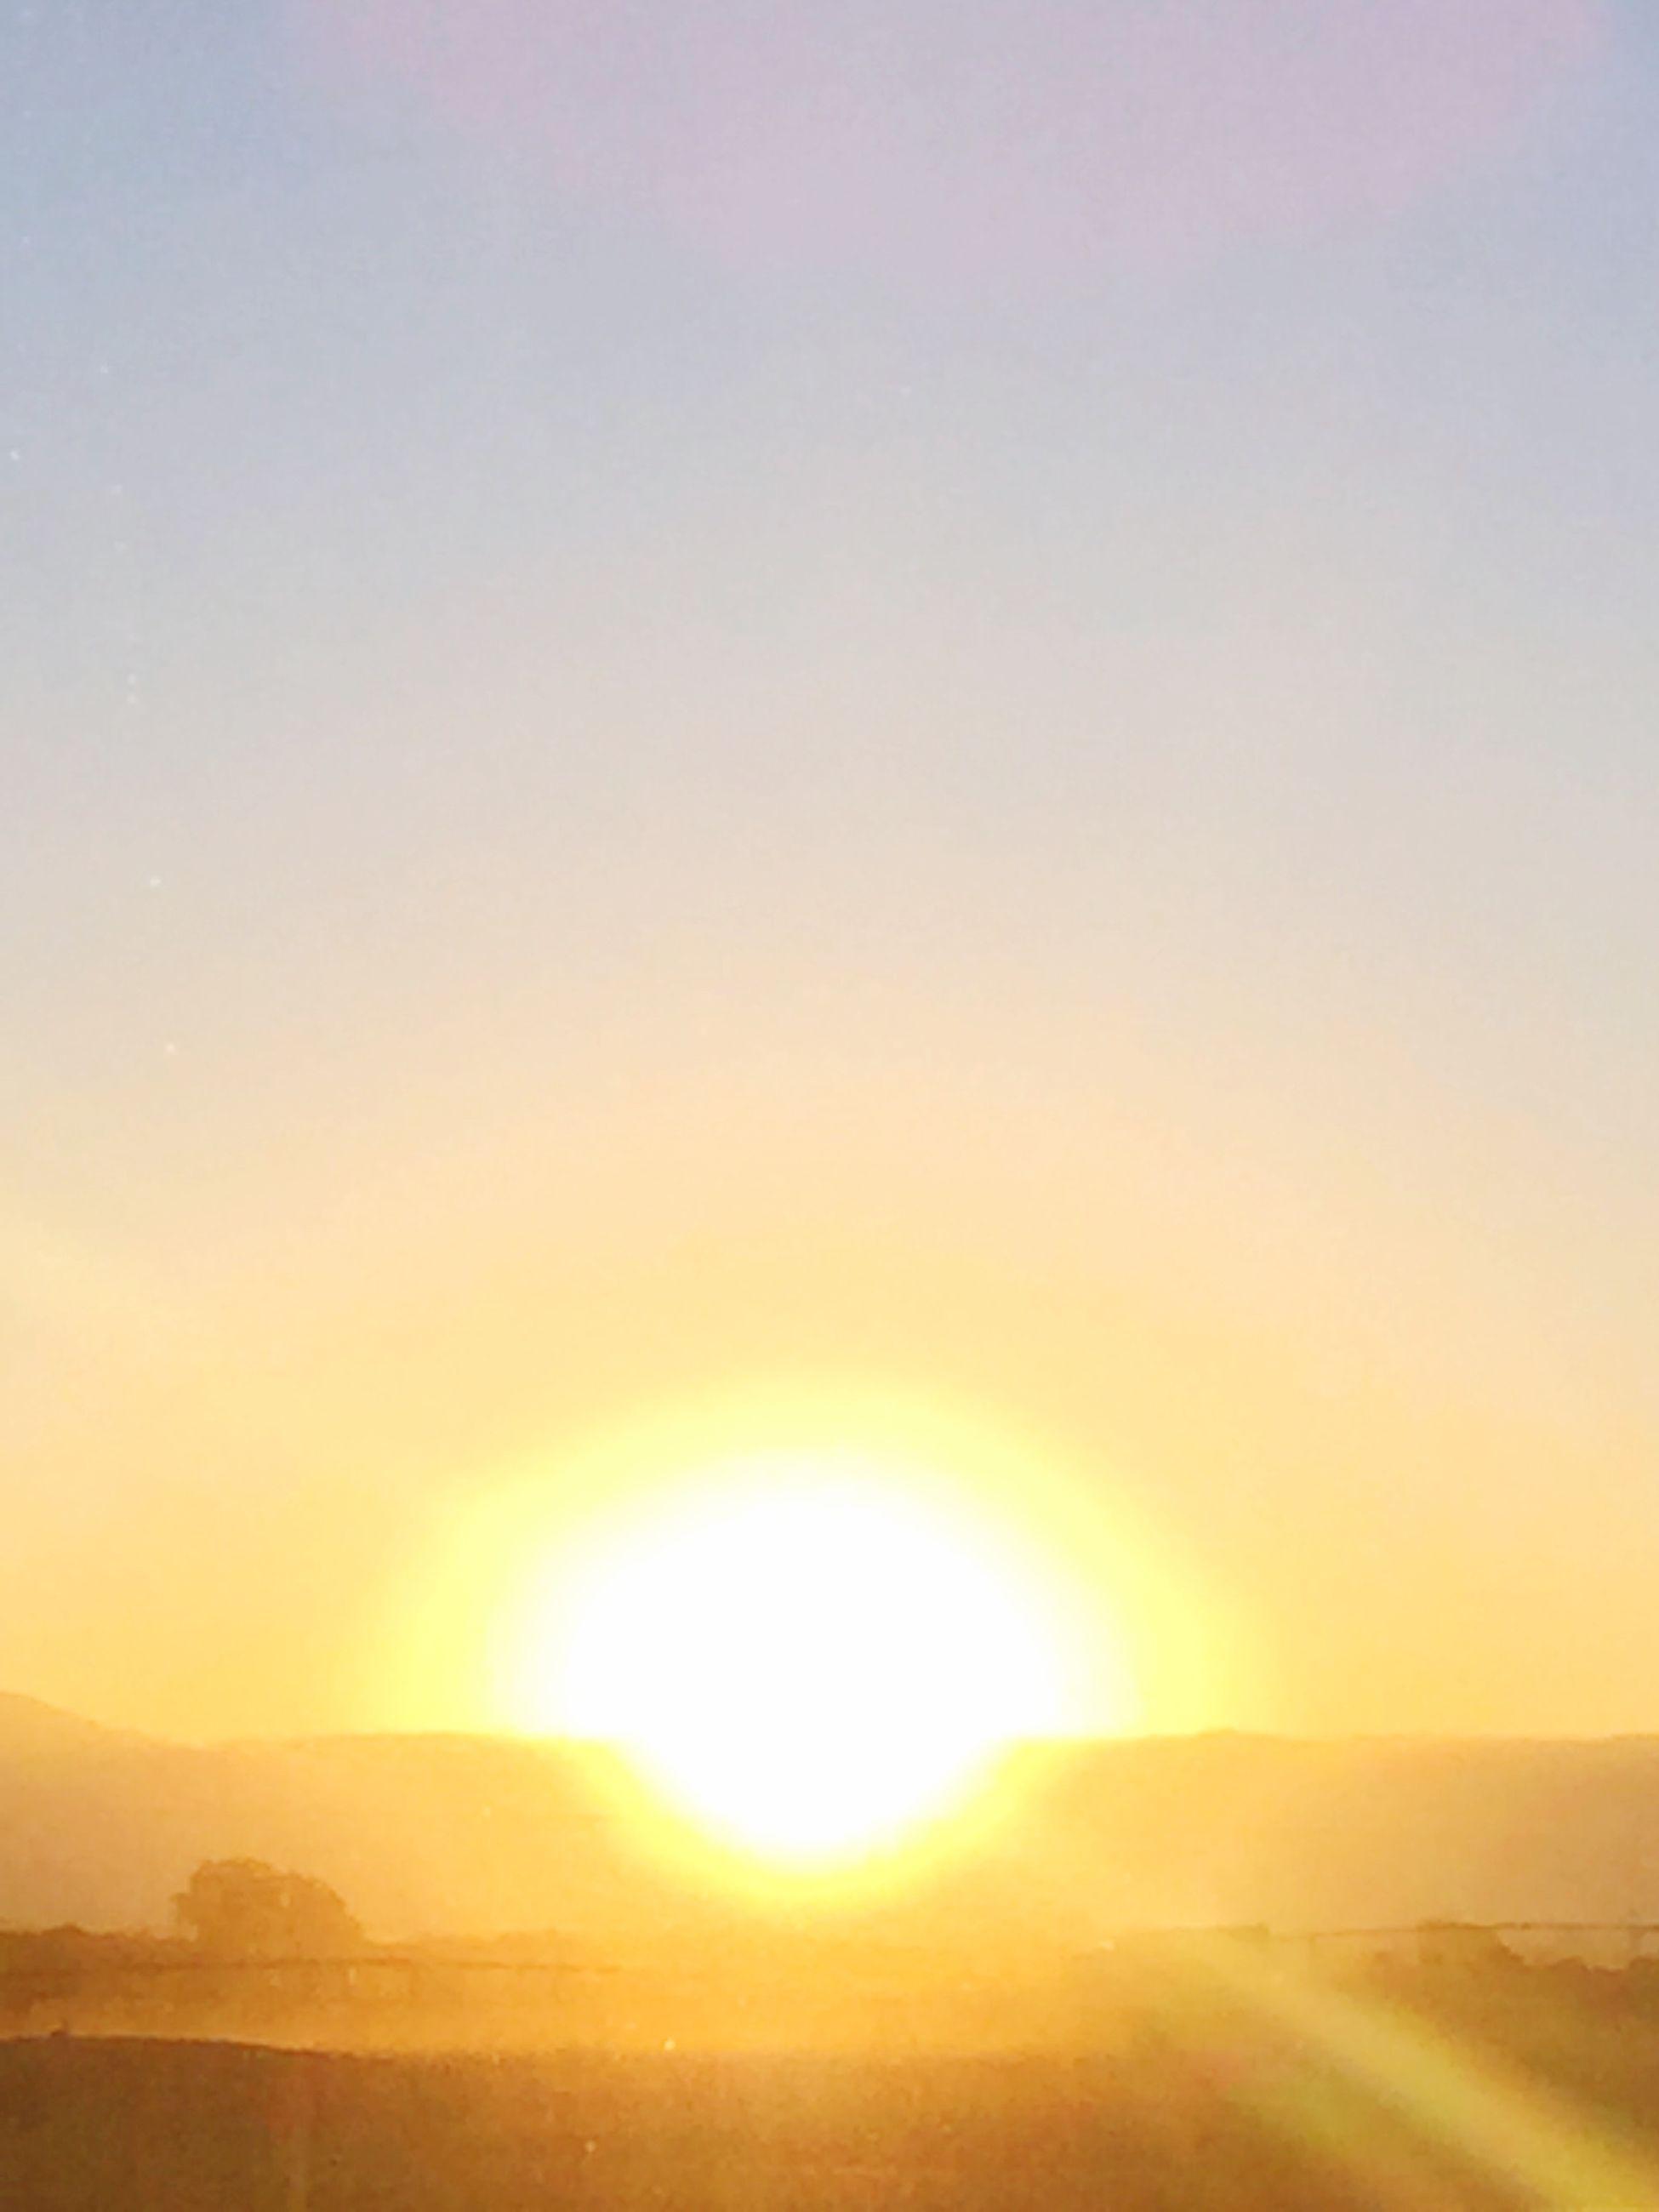 sun, sunset, tranquil scene, scenics, tranquility, beauty in nature, sunlight, sunbeam, landscape, nature, clear sky, copy space, idyllic, sky, lens flare, orange color, outdoors, non-urban scene, no people, bright